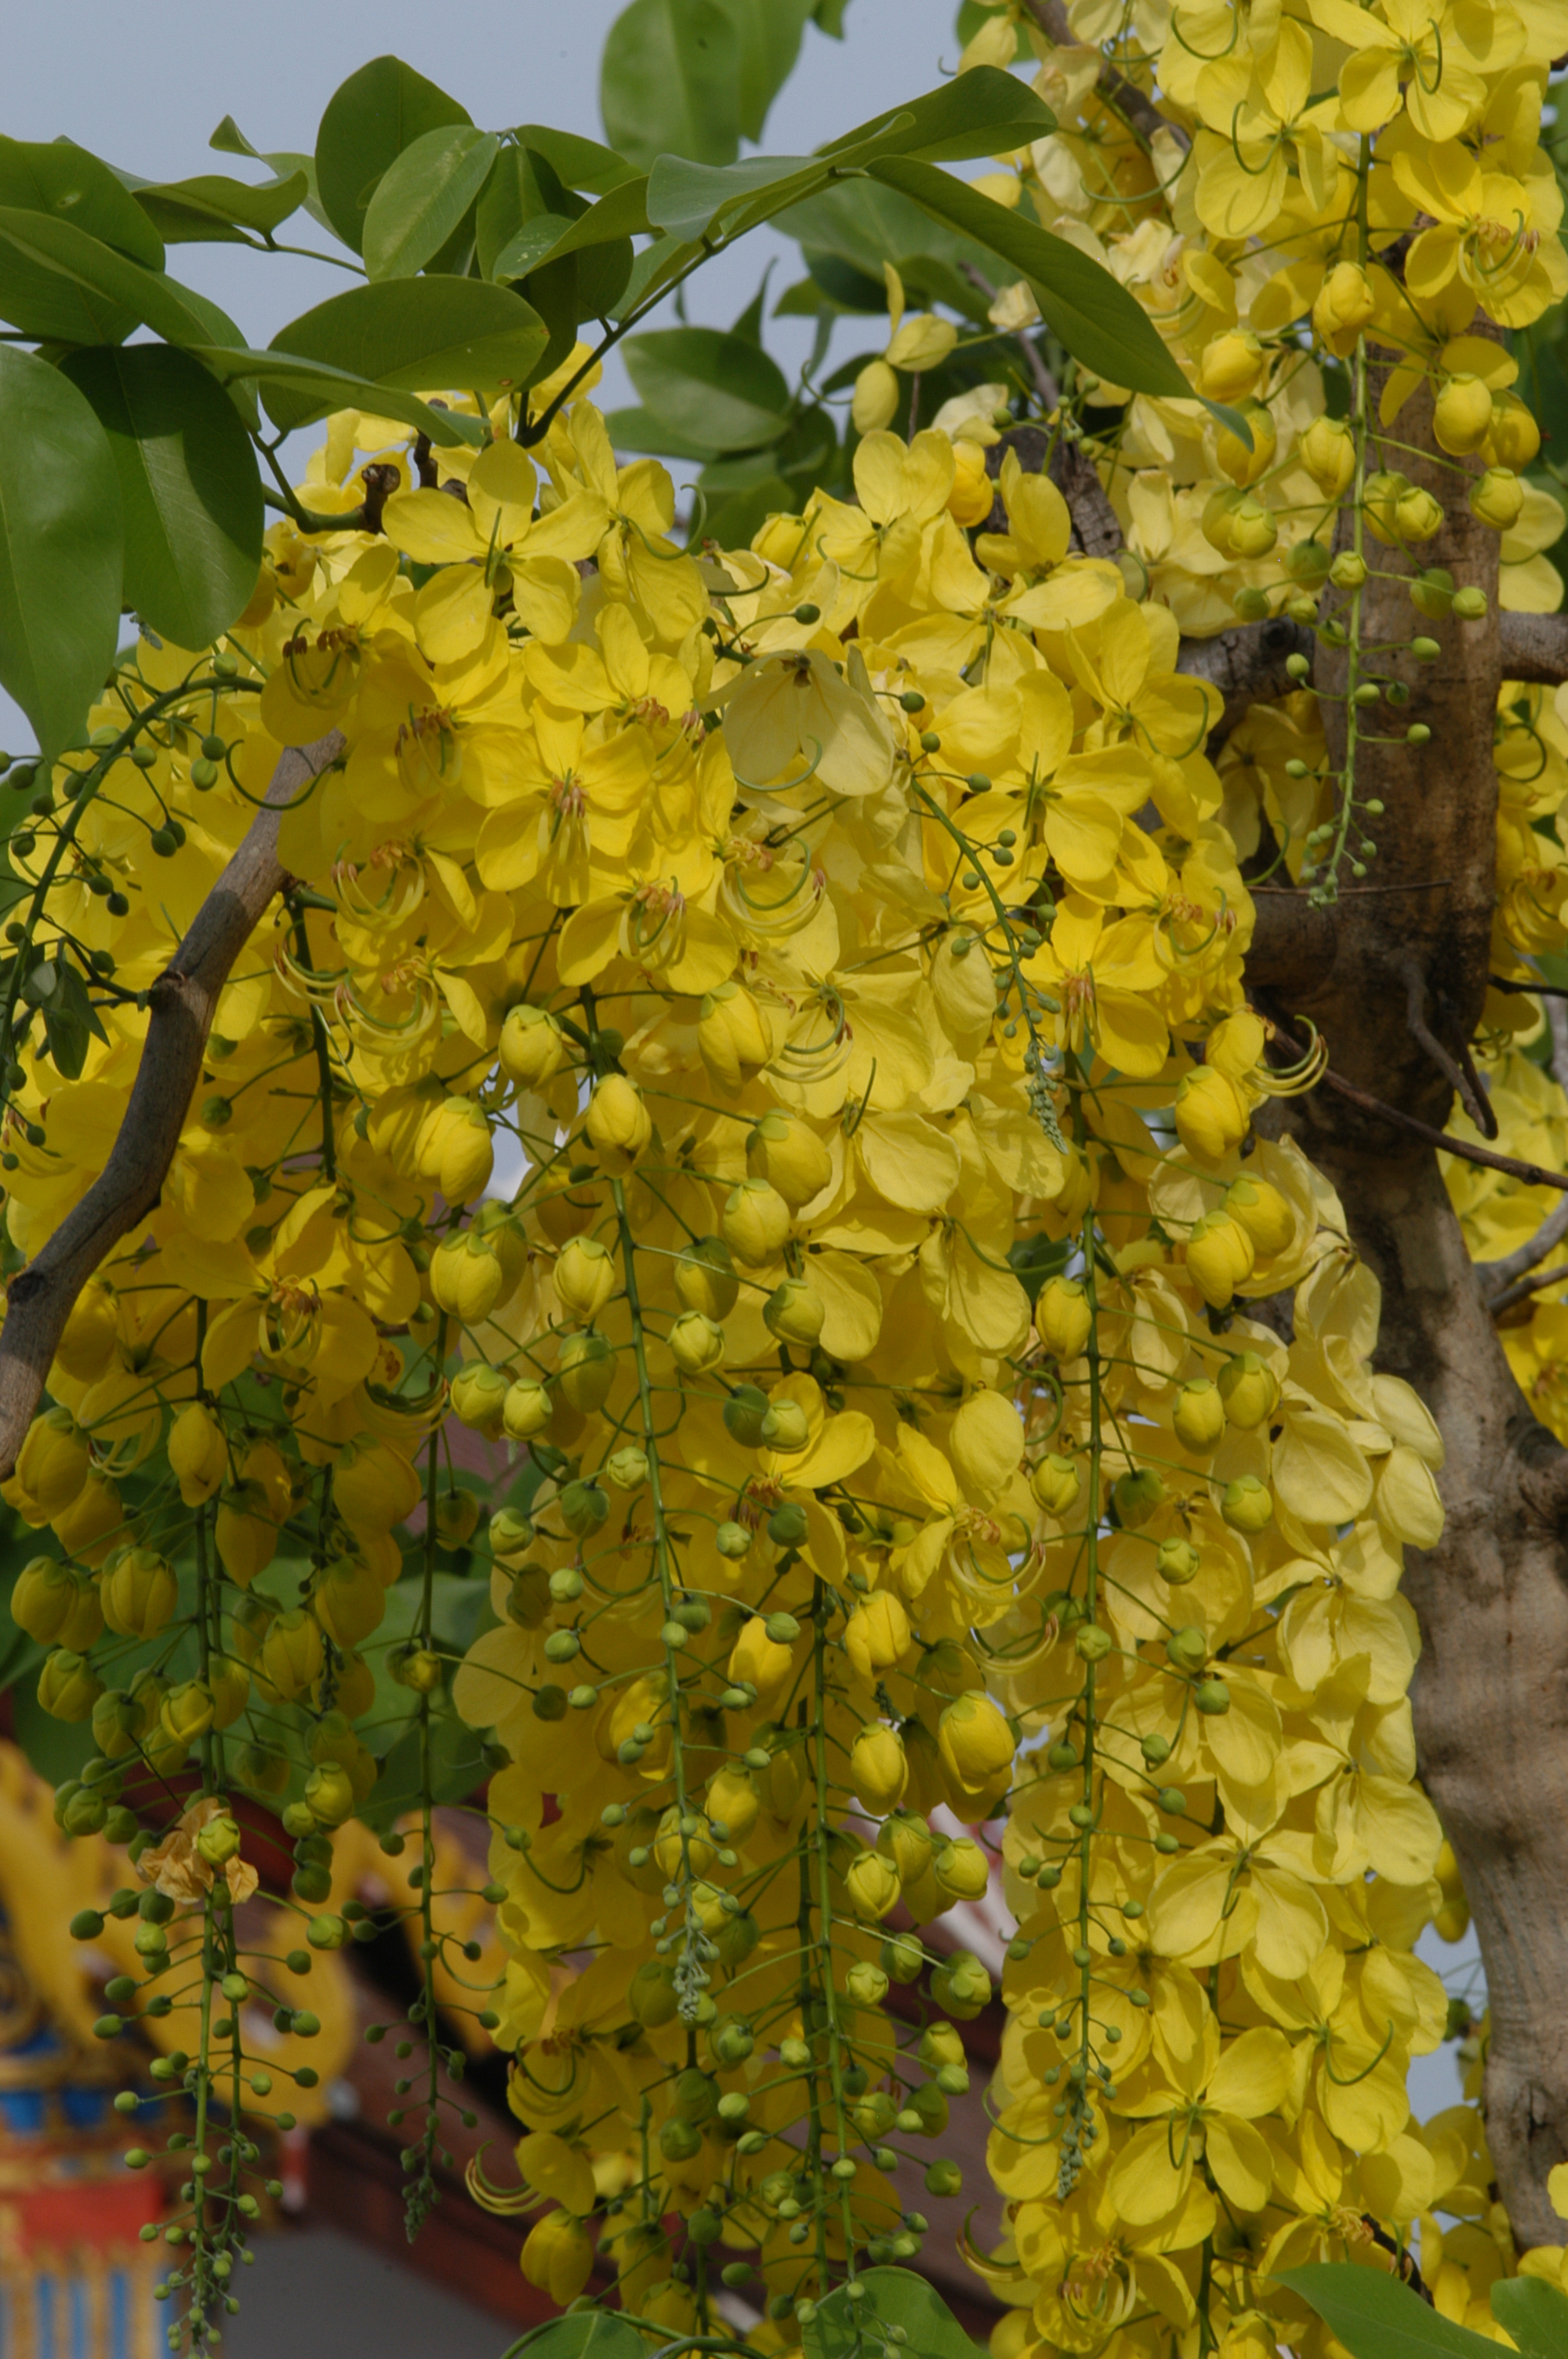 File:Cassia fistula03.JPG - Wikimedia Commons